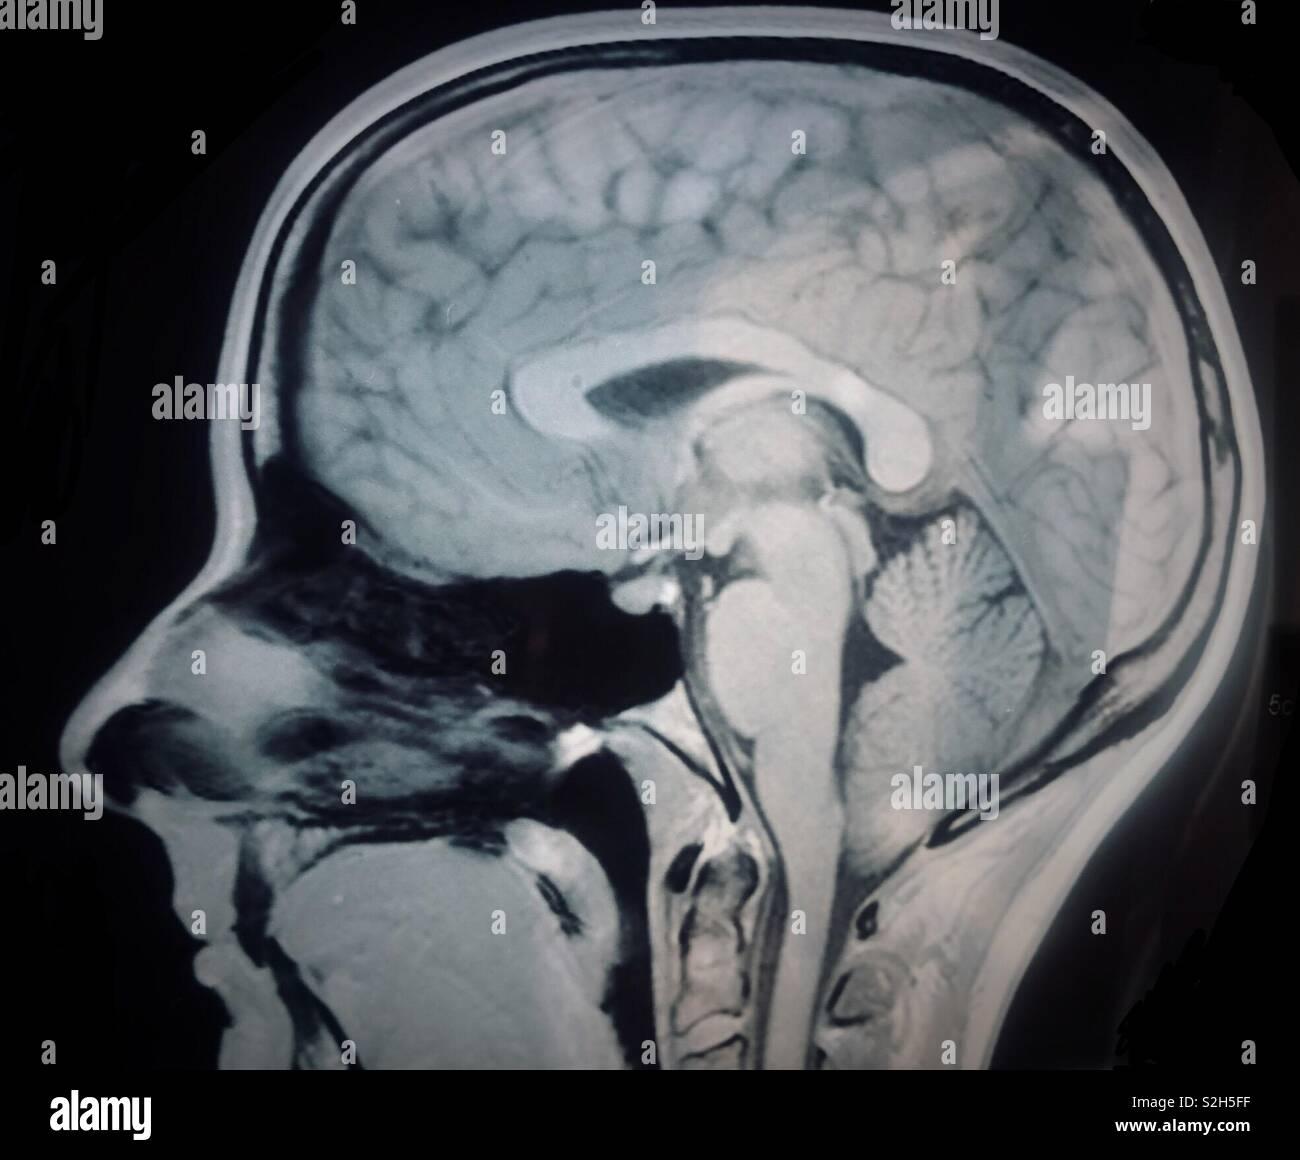 mri brain scan stock photos amp mri brain scan stock images